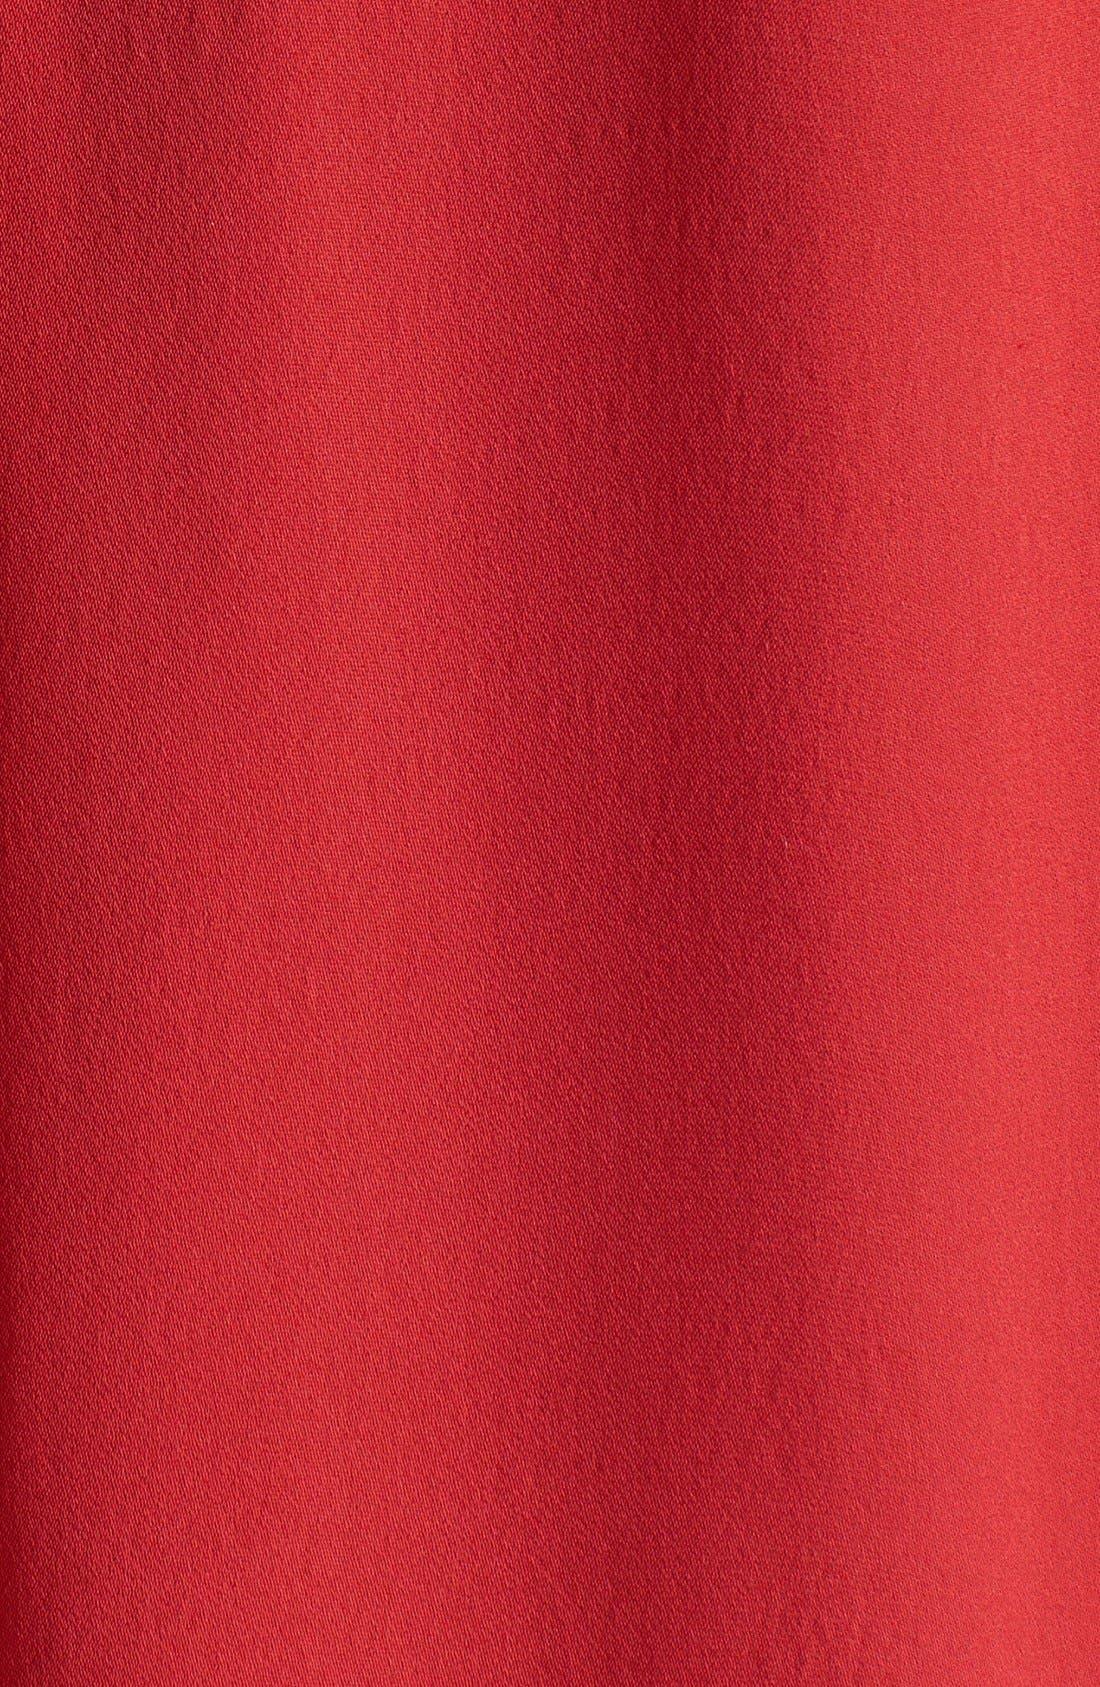 Alternate Image 3  - Joie 'Glenna' V-Neck Silk Blouse